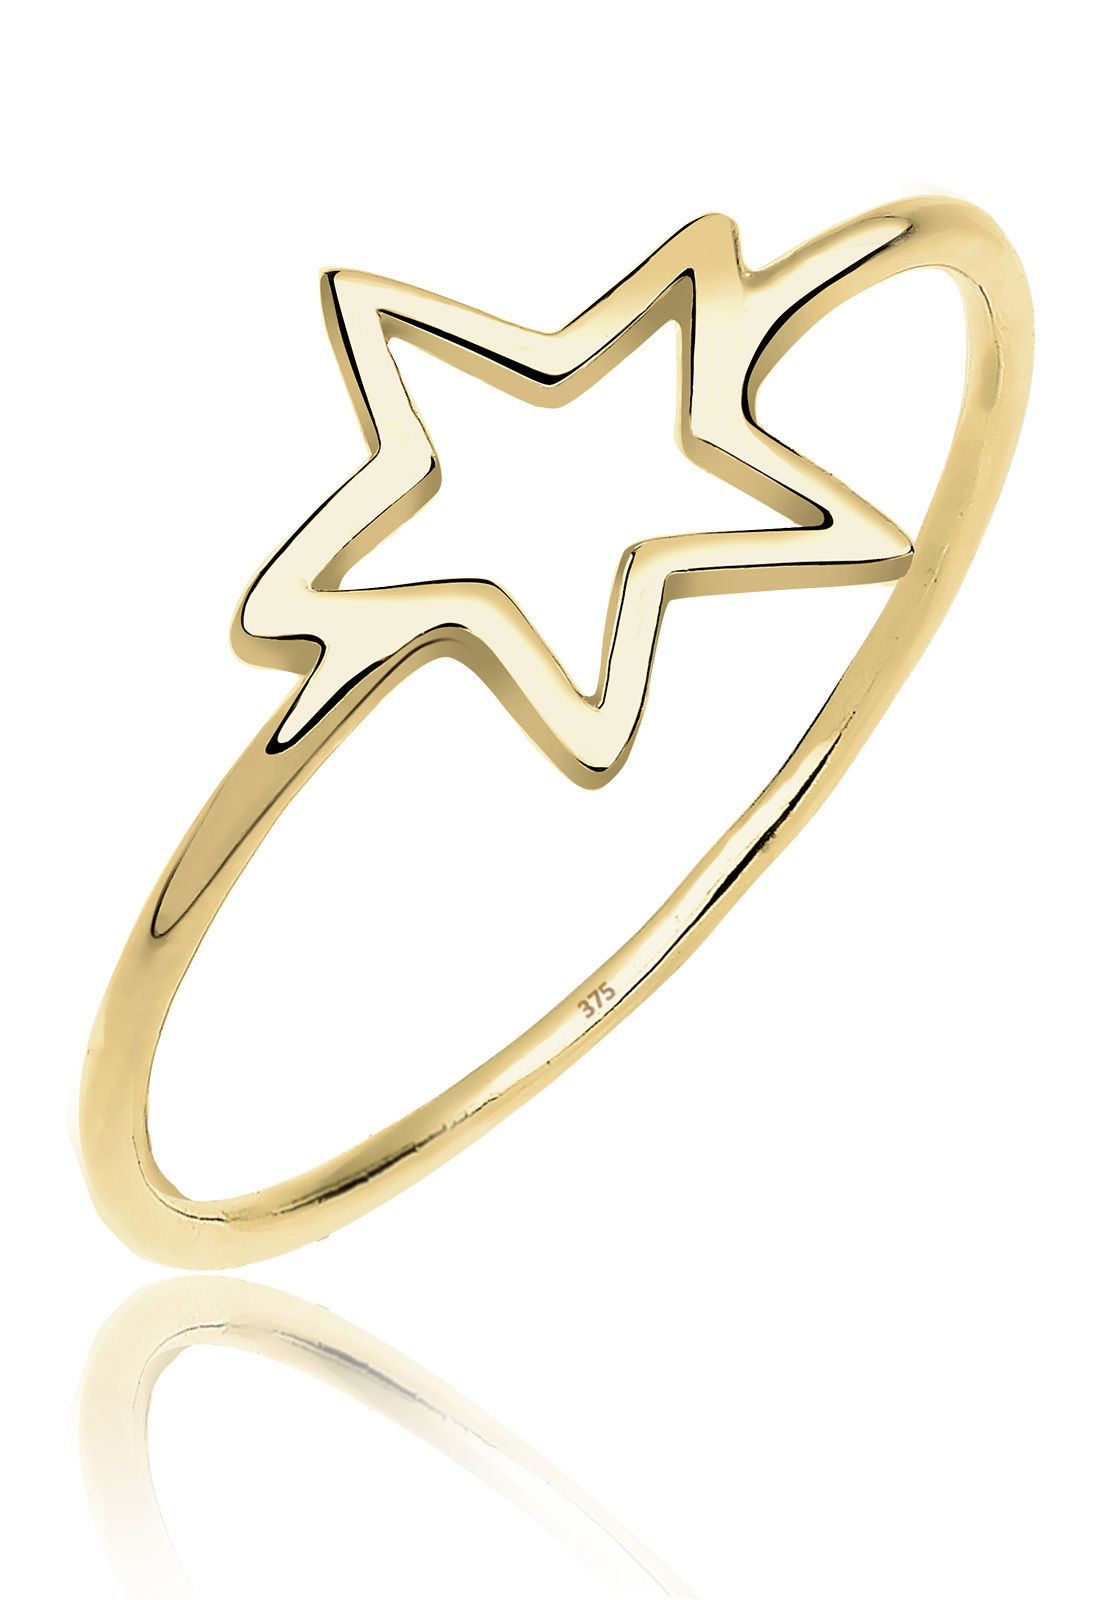 Ring Stern | 375 Gelbgold